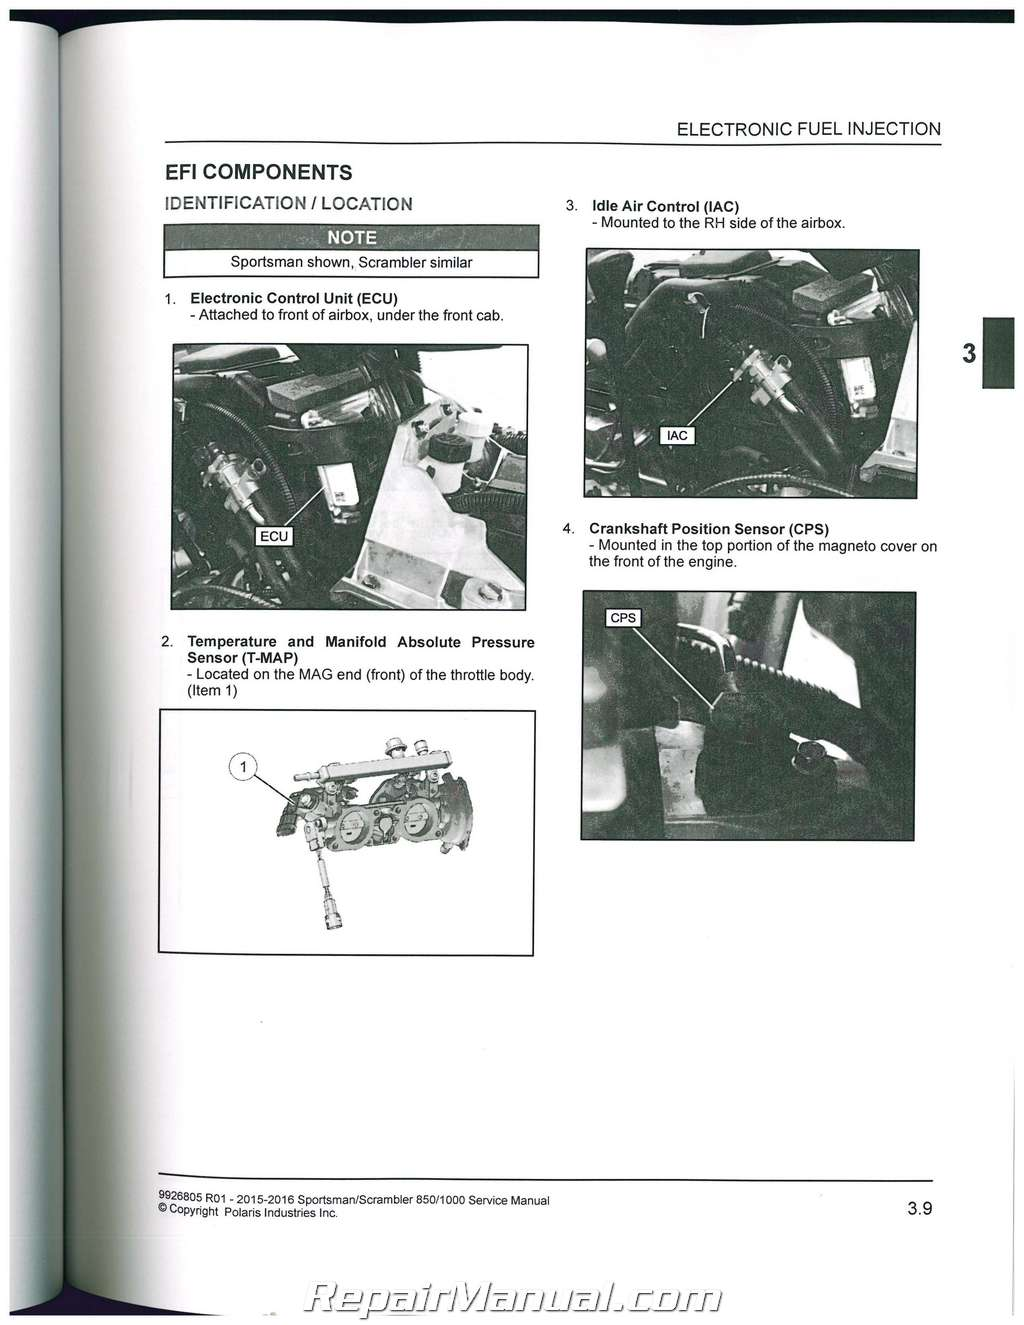 2015 2016 polaris scrambler sportsman 850 1000 atv service manual rh ebay  co uk polaris scrambler 400 repair manual polaris scrambler 90 repair  manual pdf